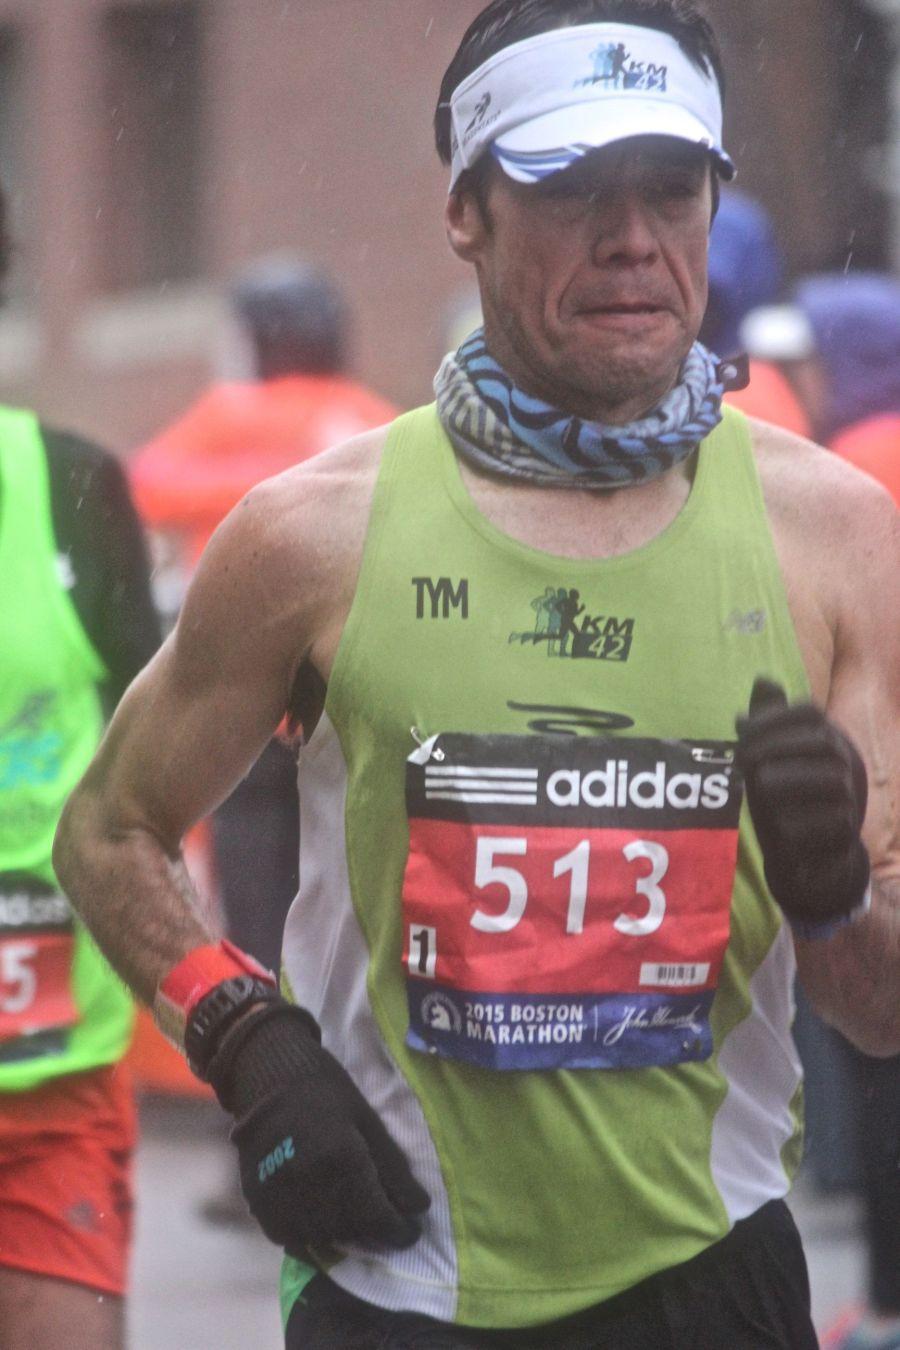 boston marathon april 20 2015 racer number 513 rain